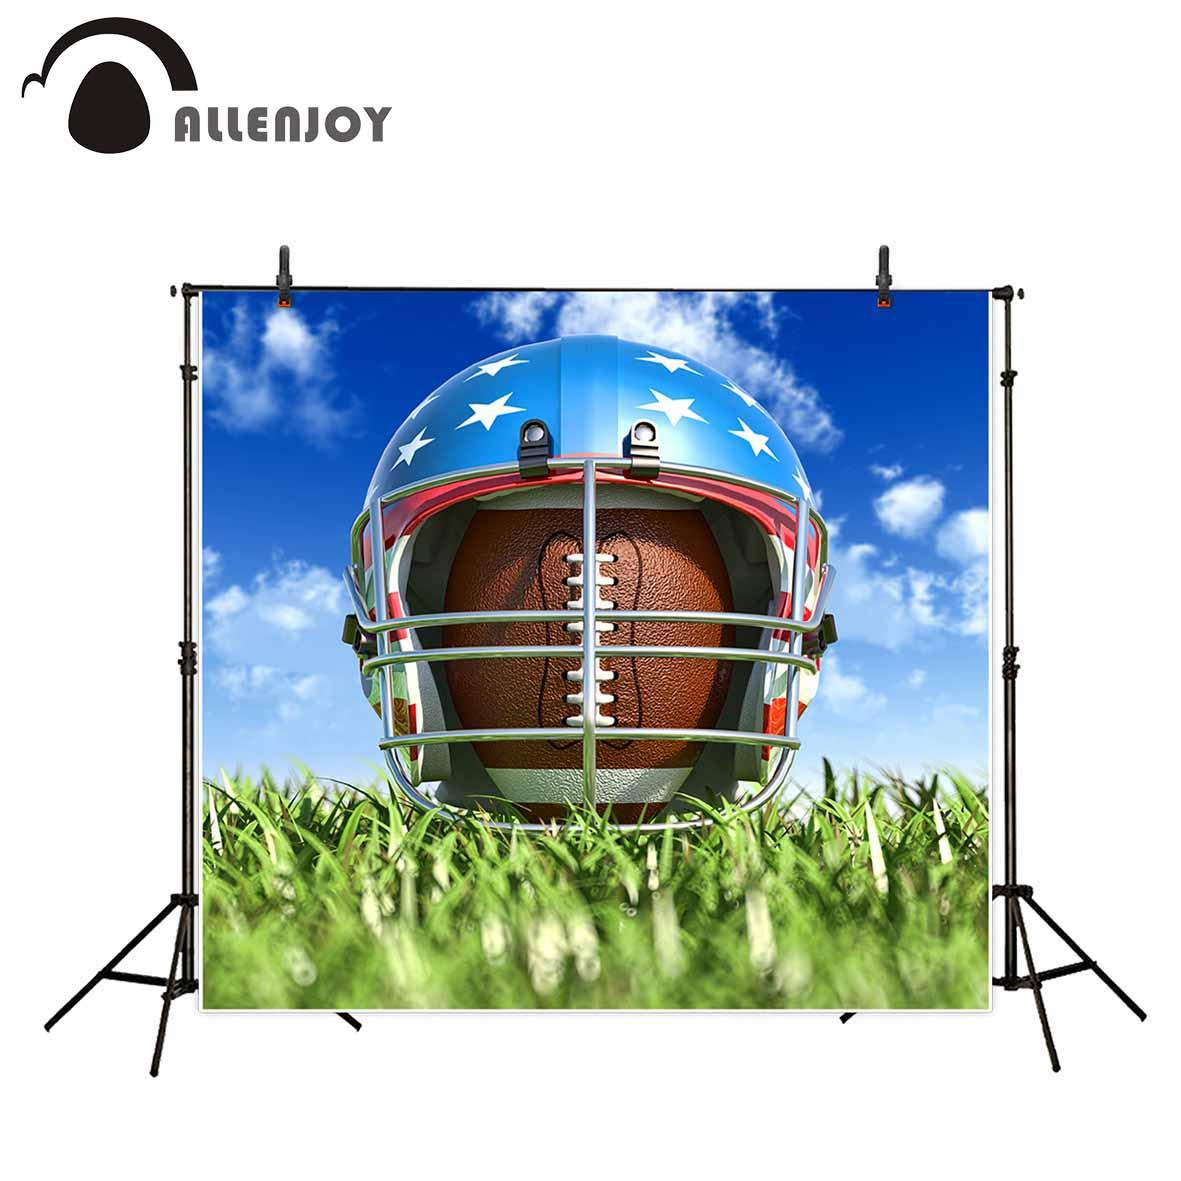 Allenjoy vinyl photography background Grassland Football Helmets American Sports professional festival backdrop photographic